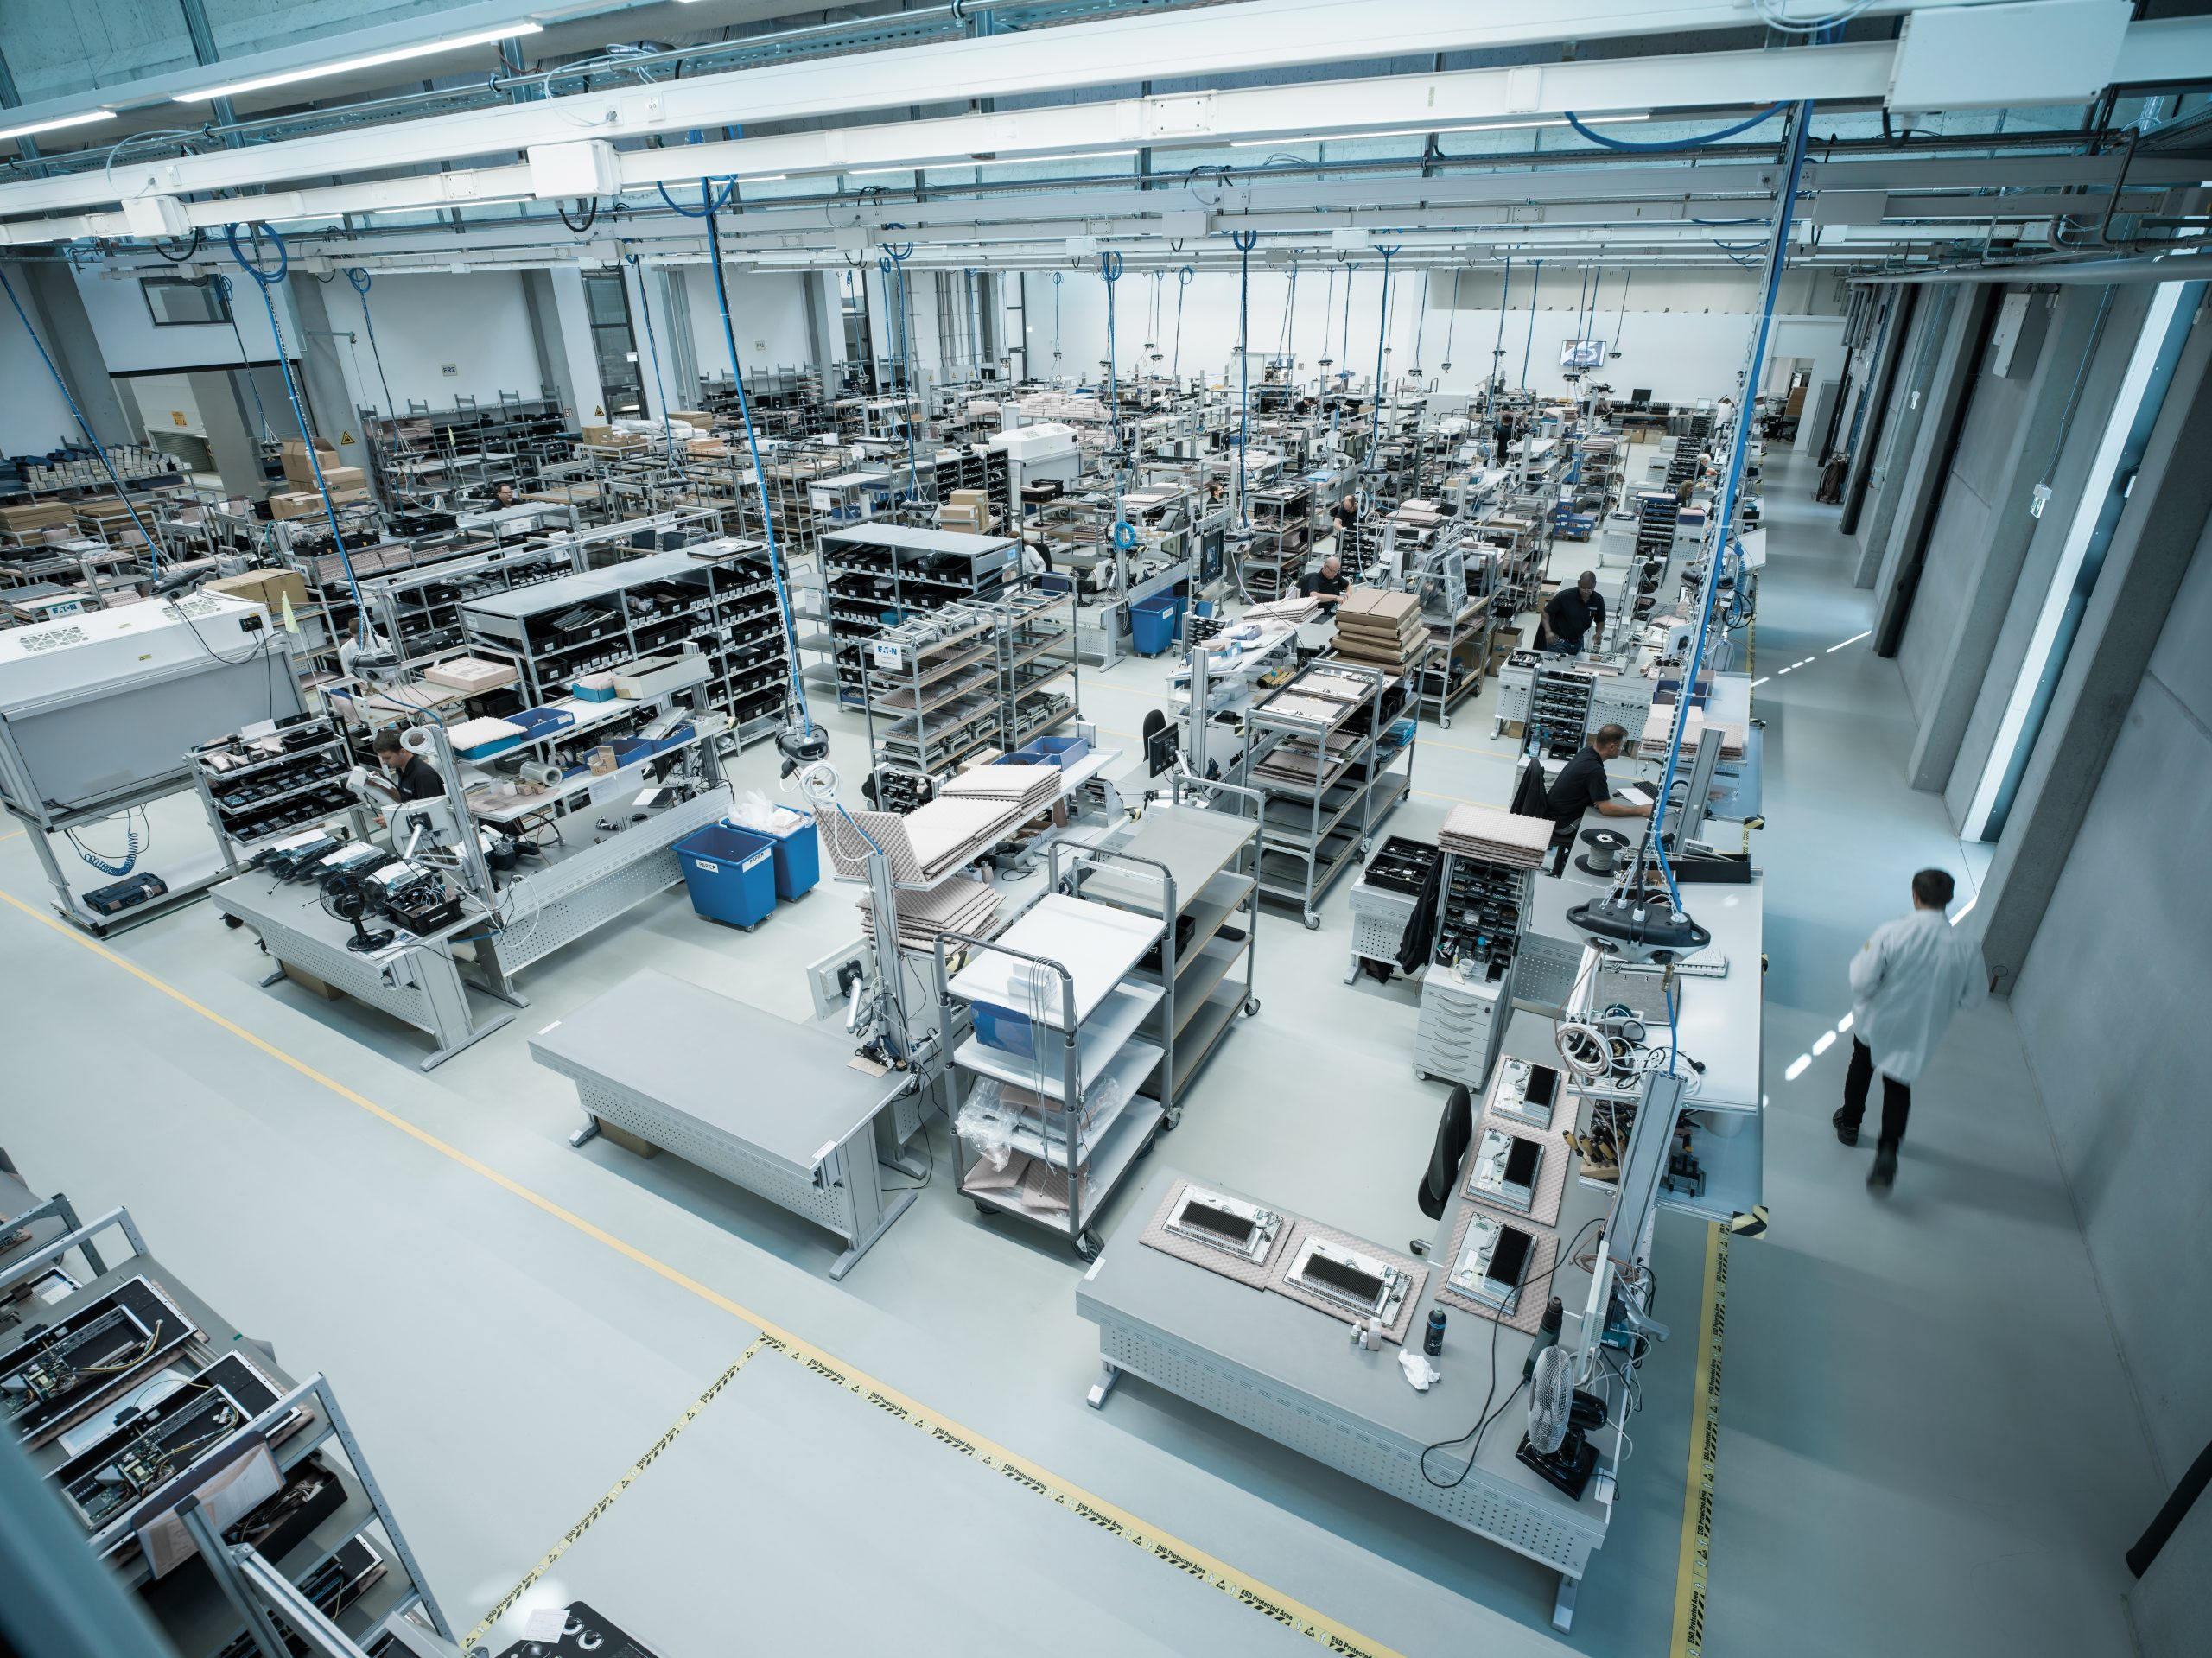 Bild: Schubert System Elektronik GmbH